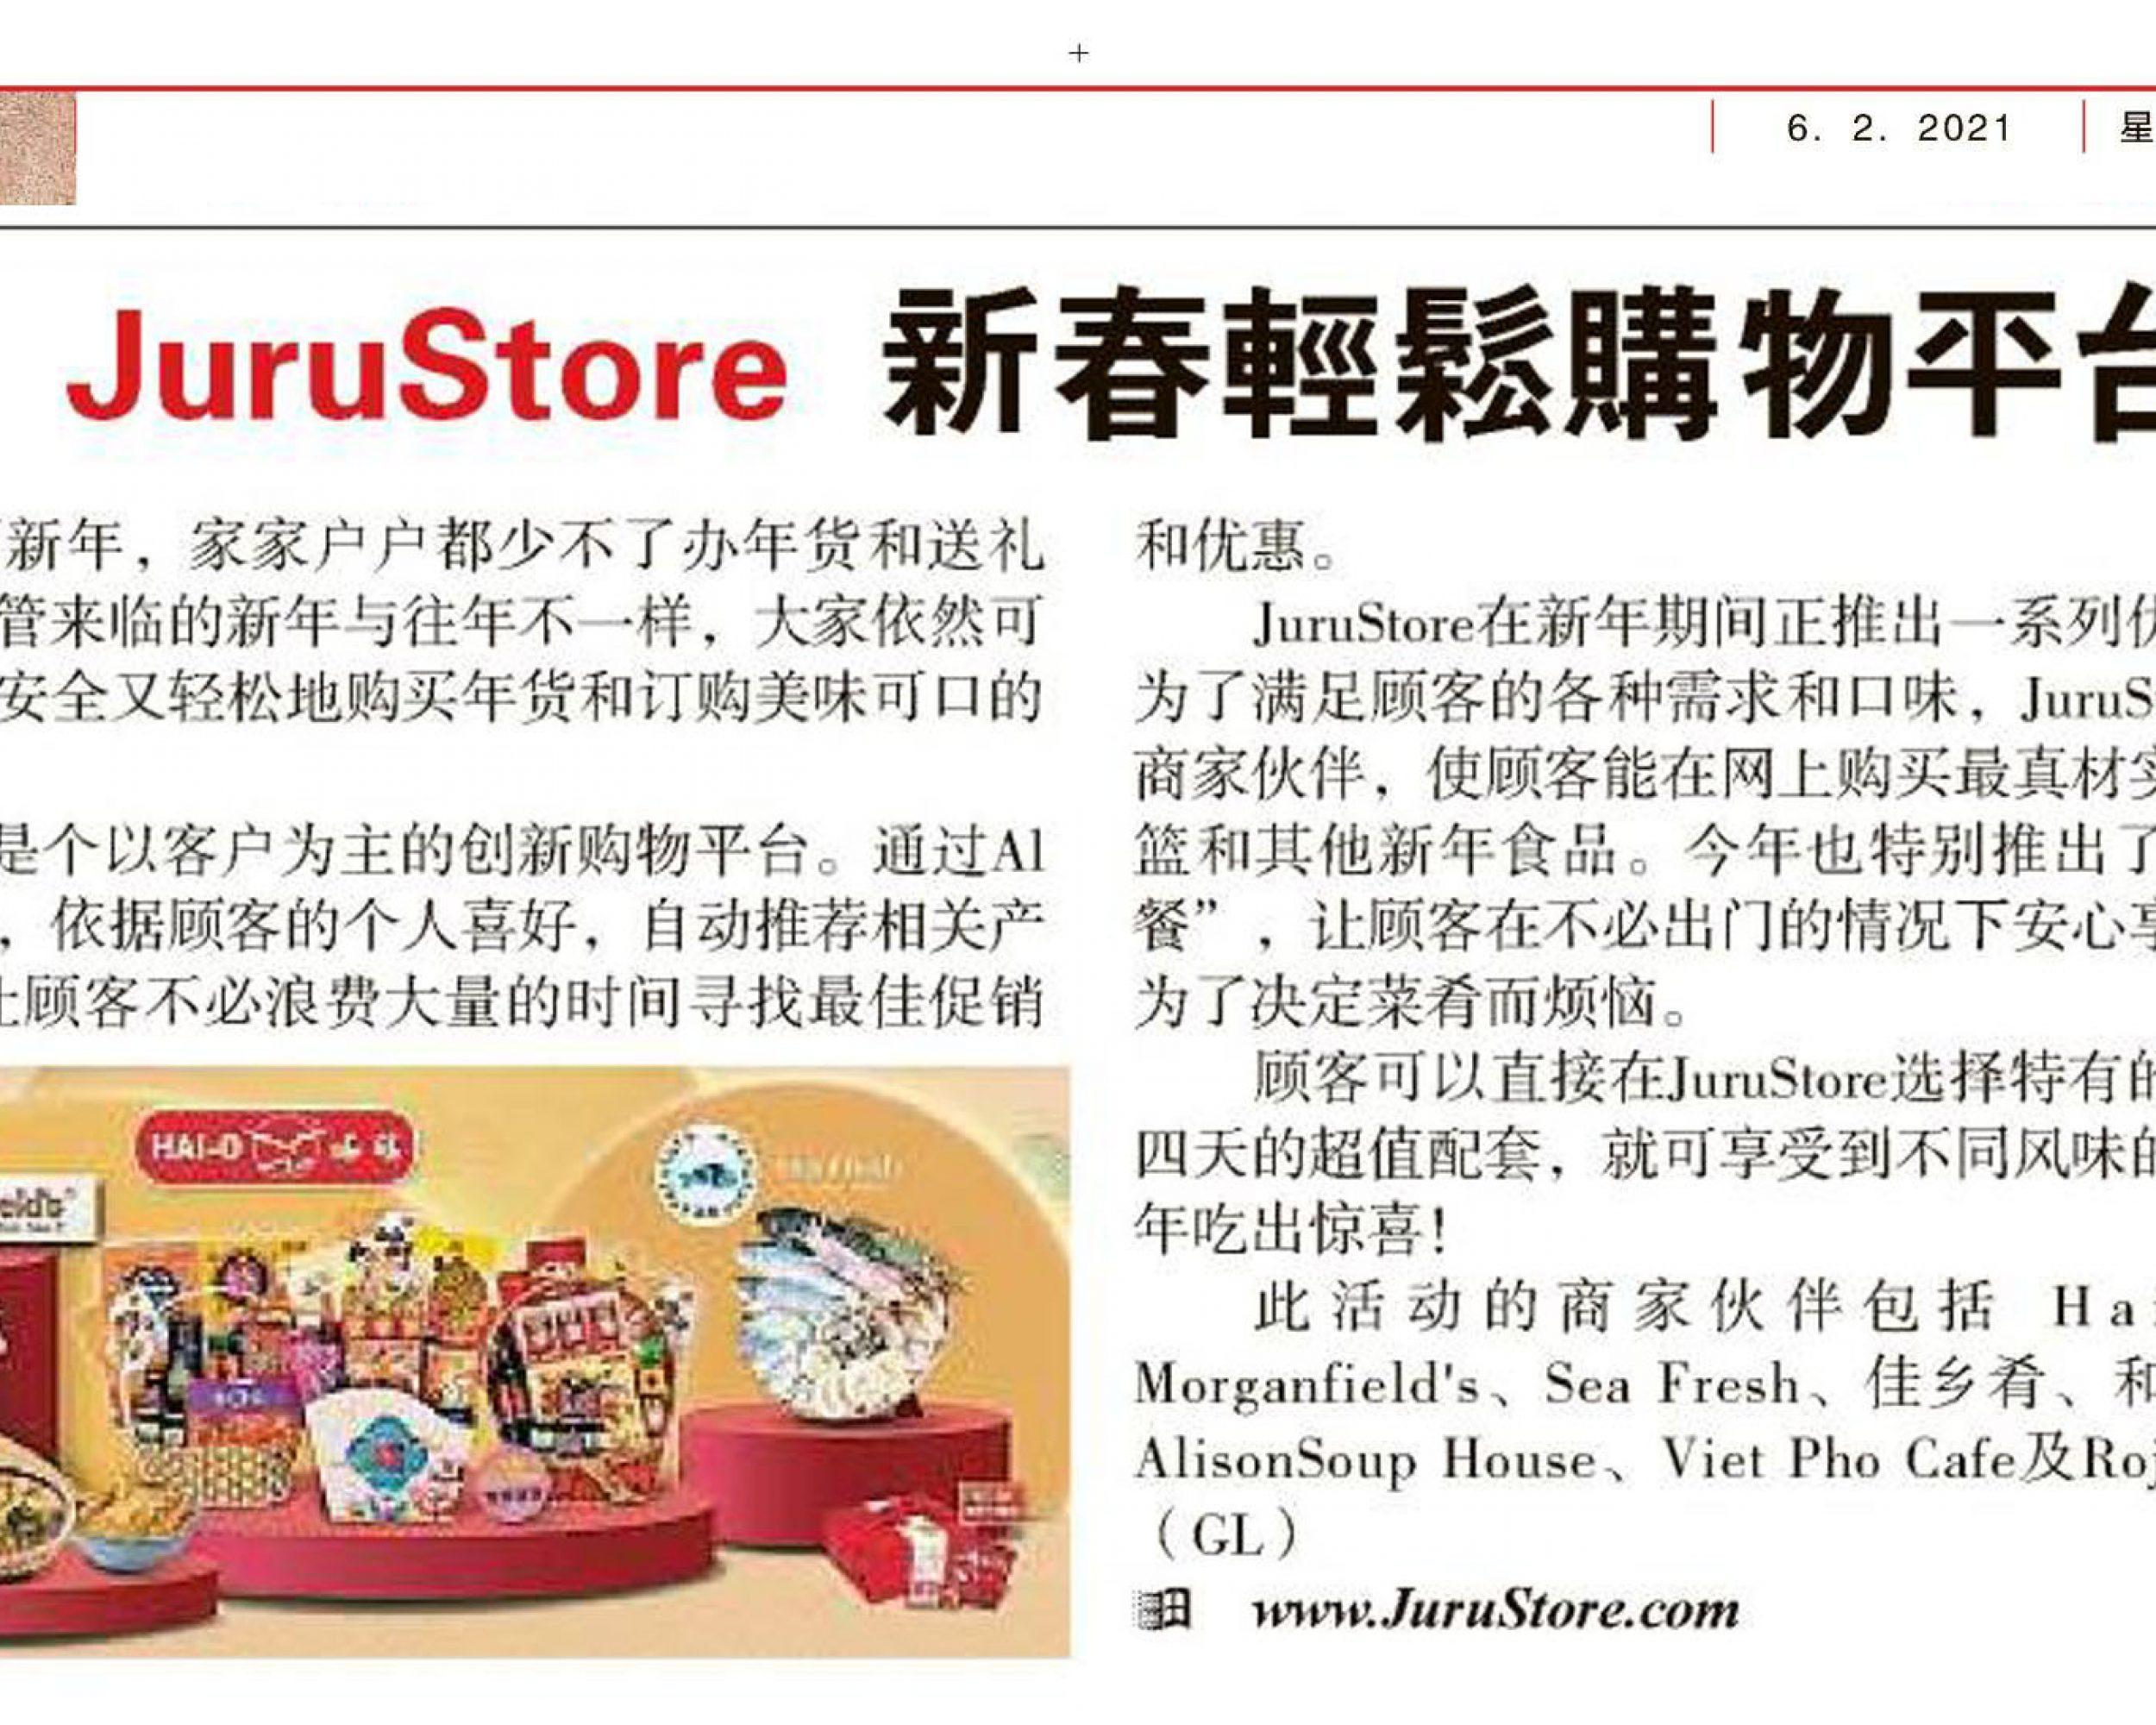 JuruStore in SinChew Newspaper 6.2.2021